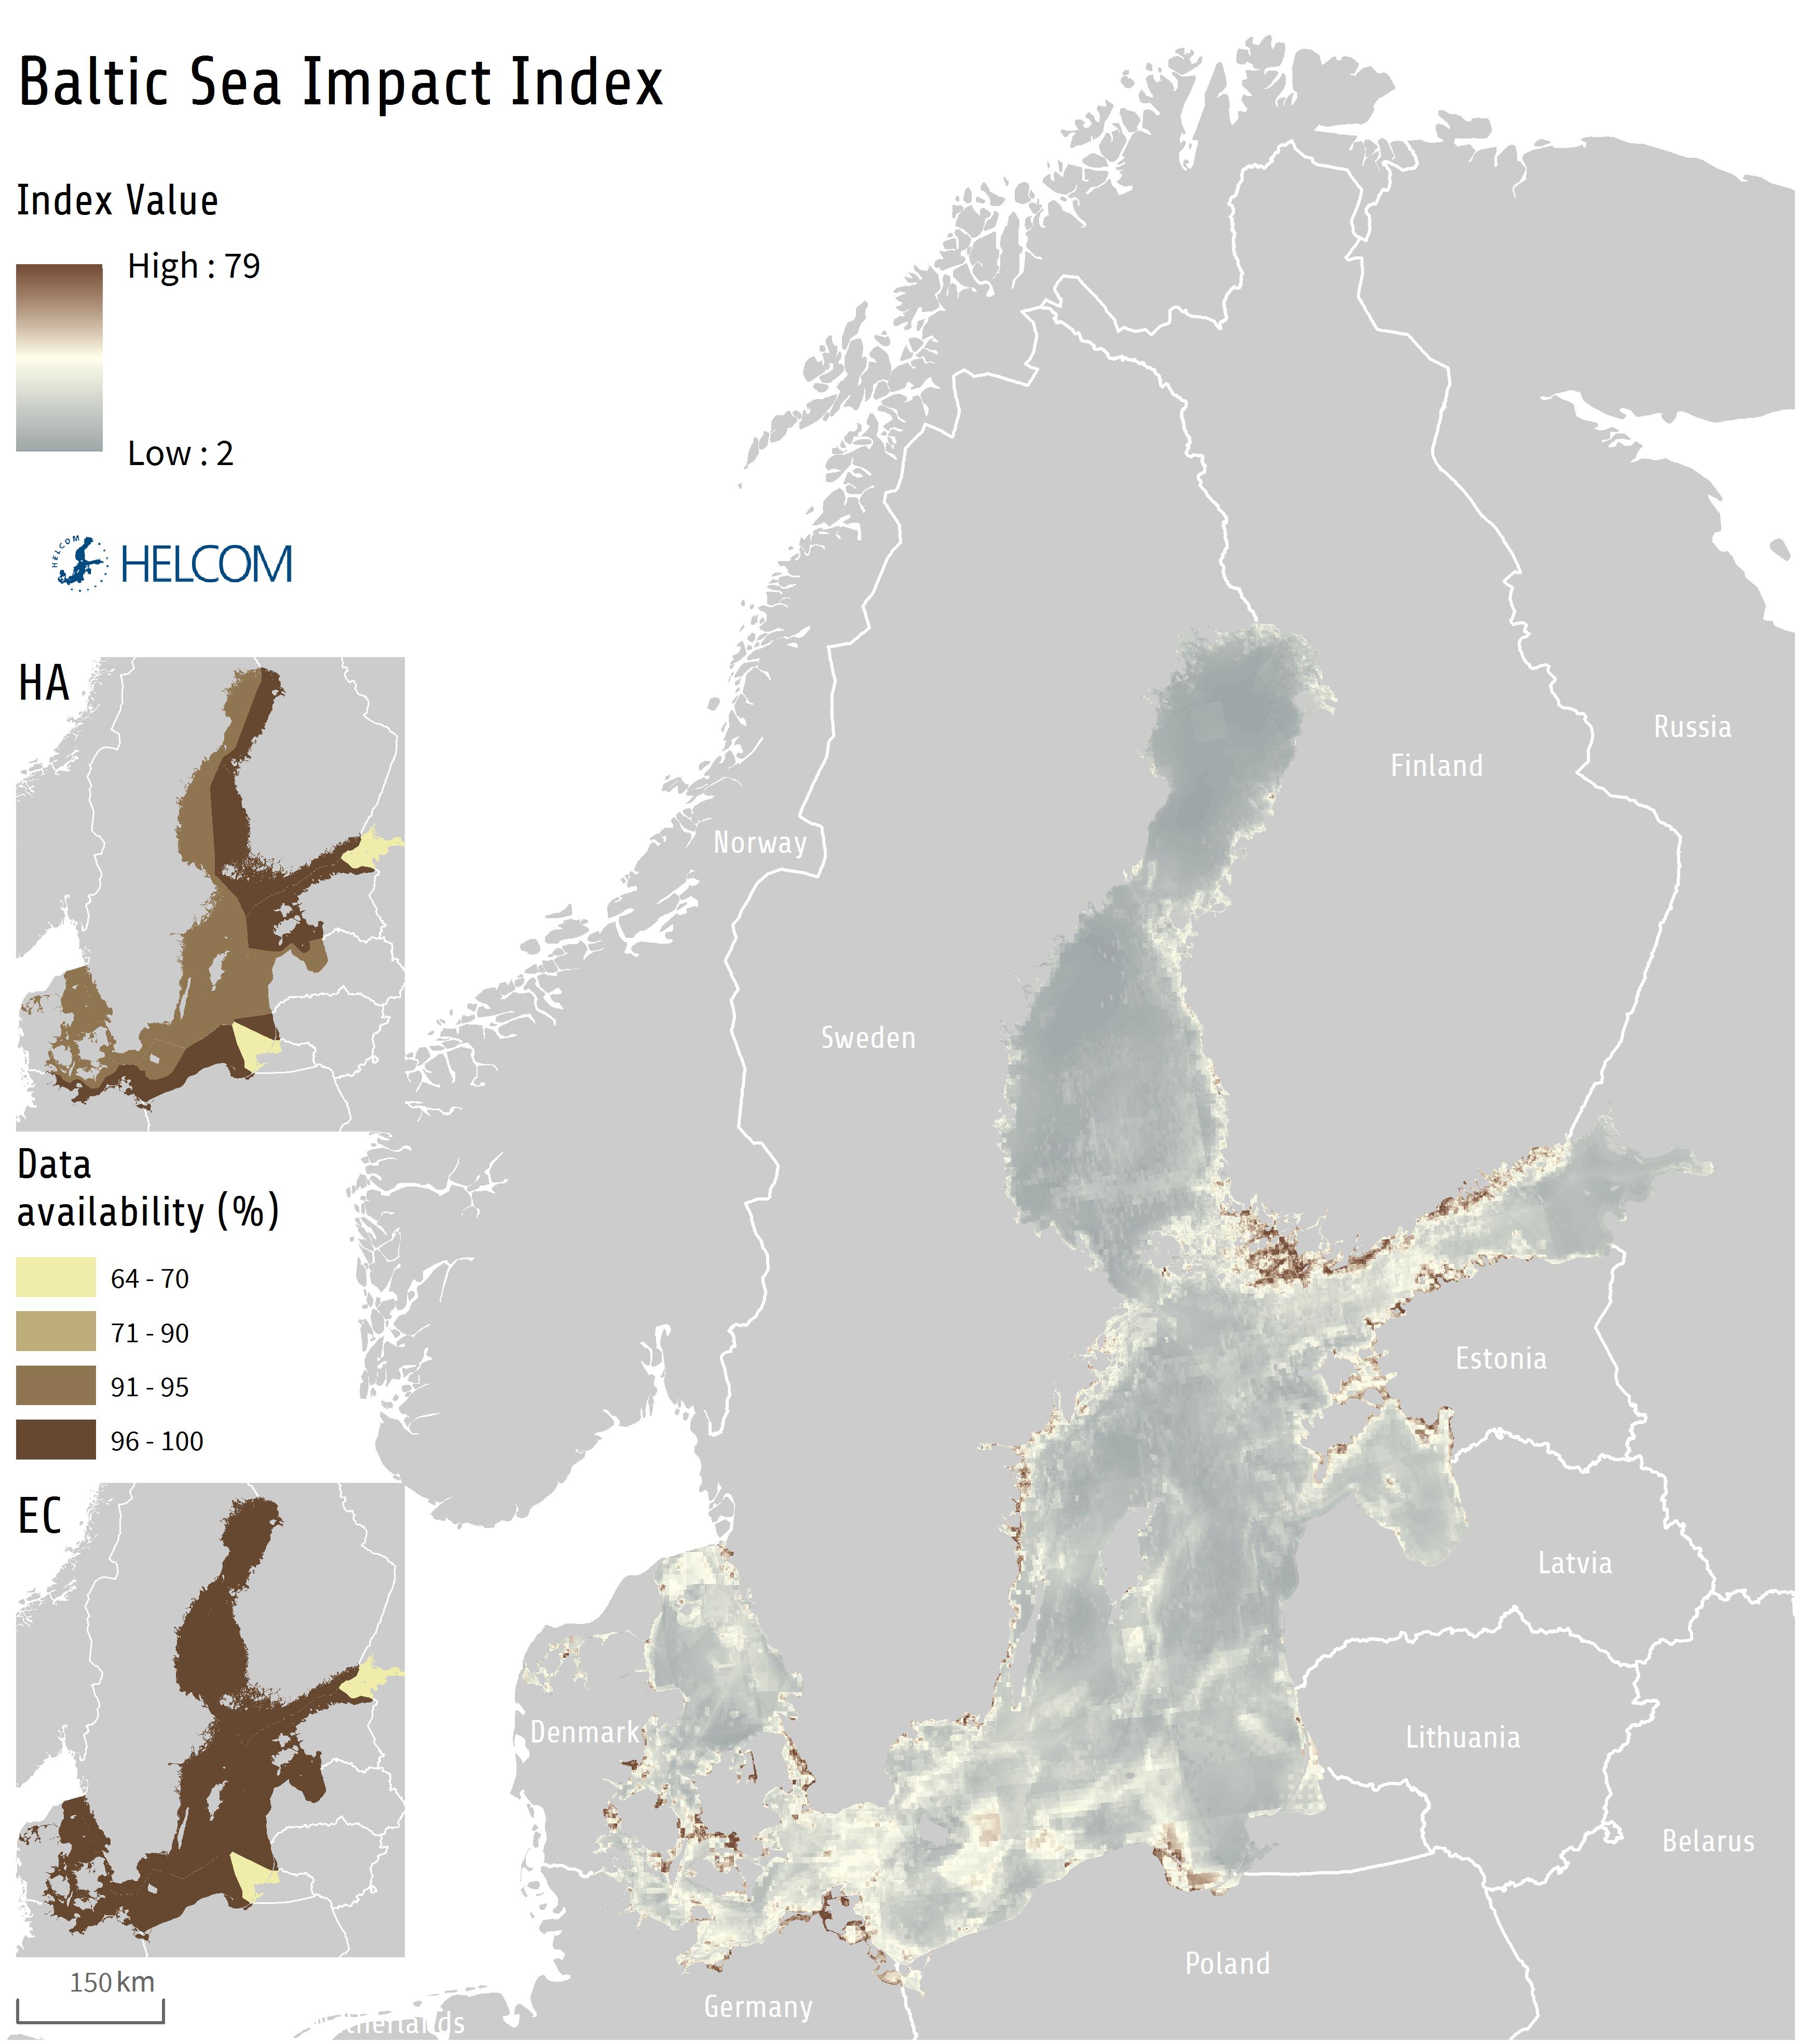 HELCOM HOLASII Fig 6.2 The Baltic Sea Impact Index